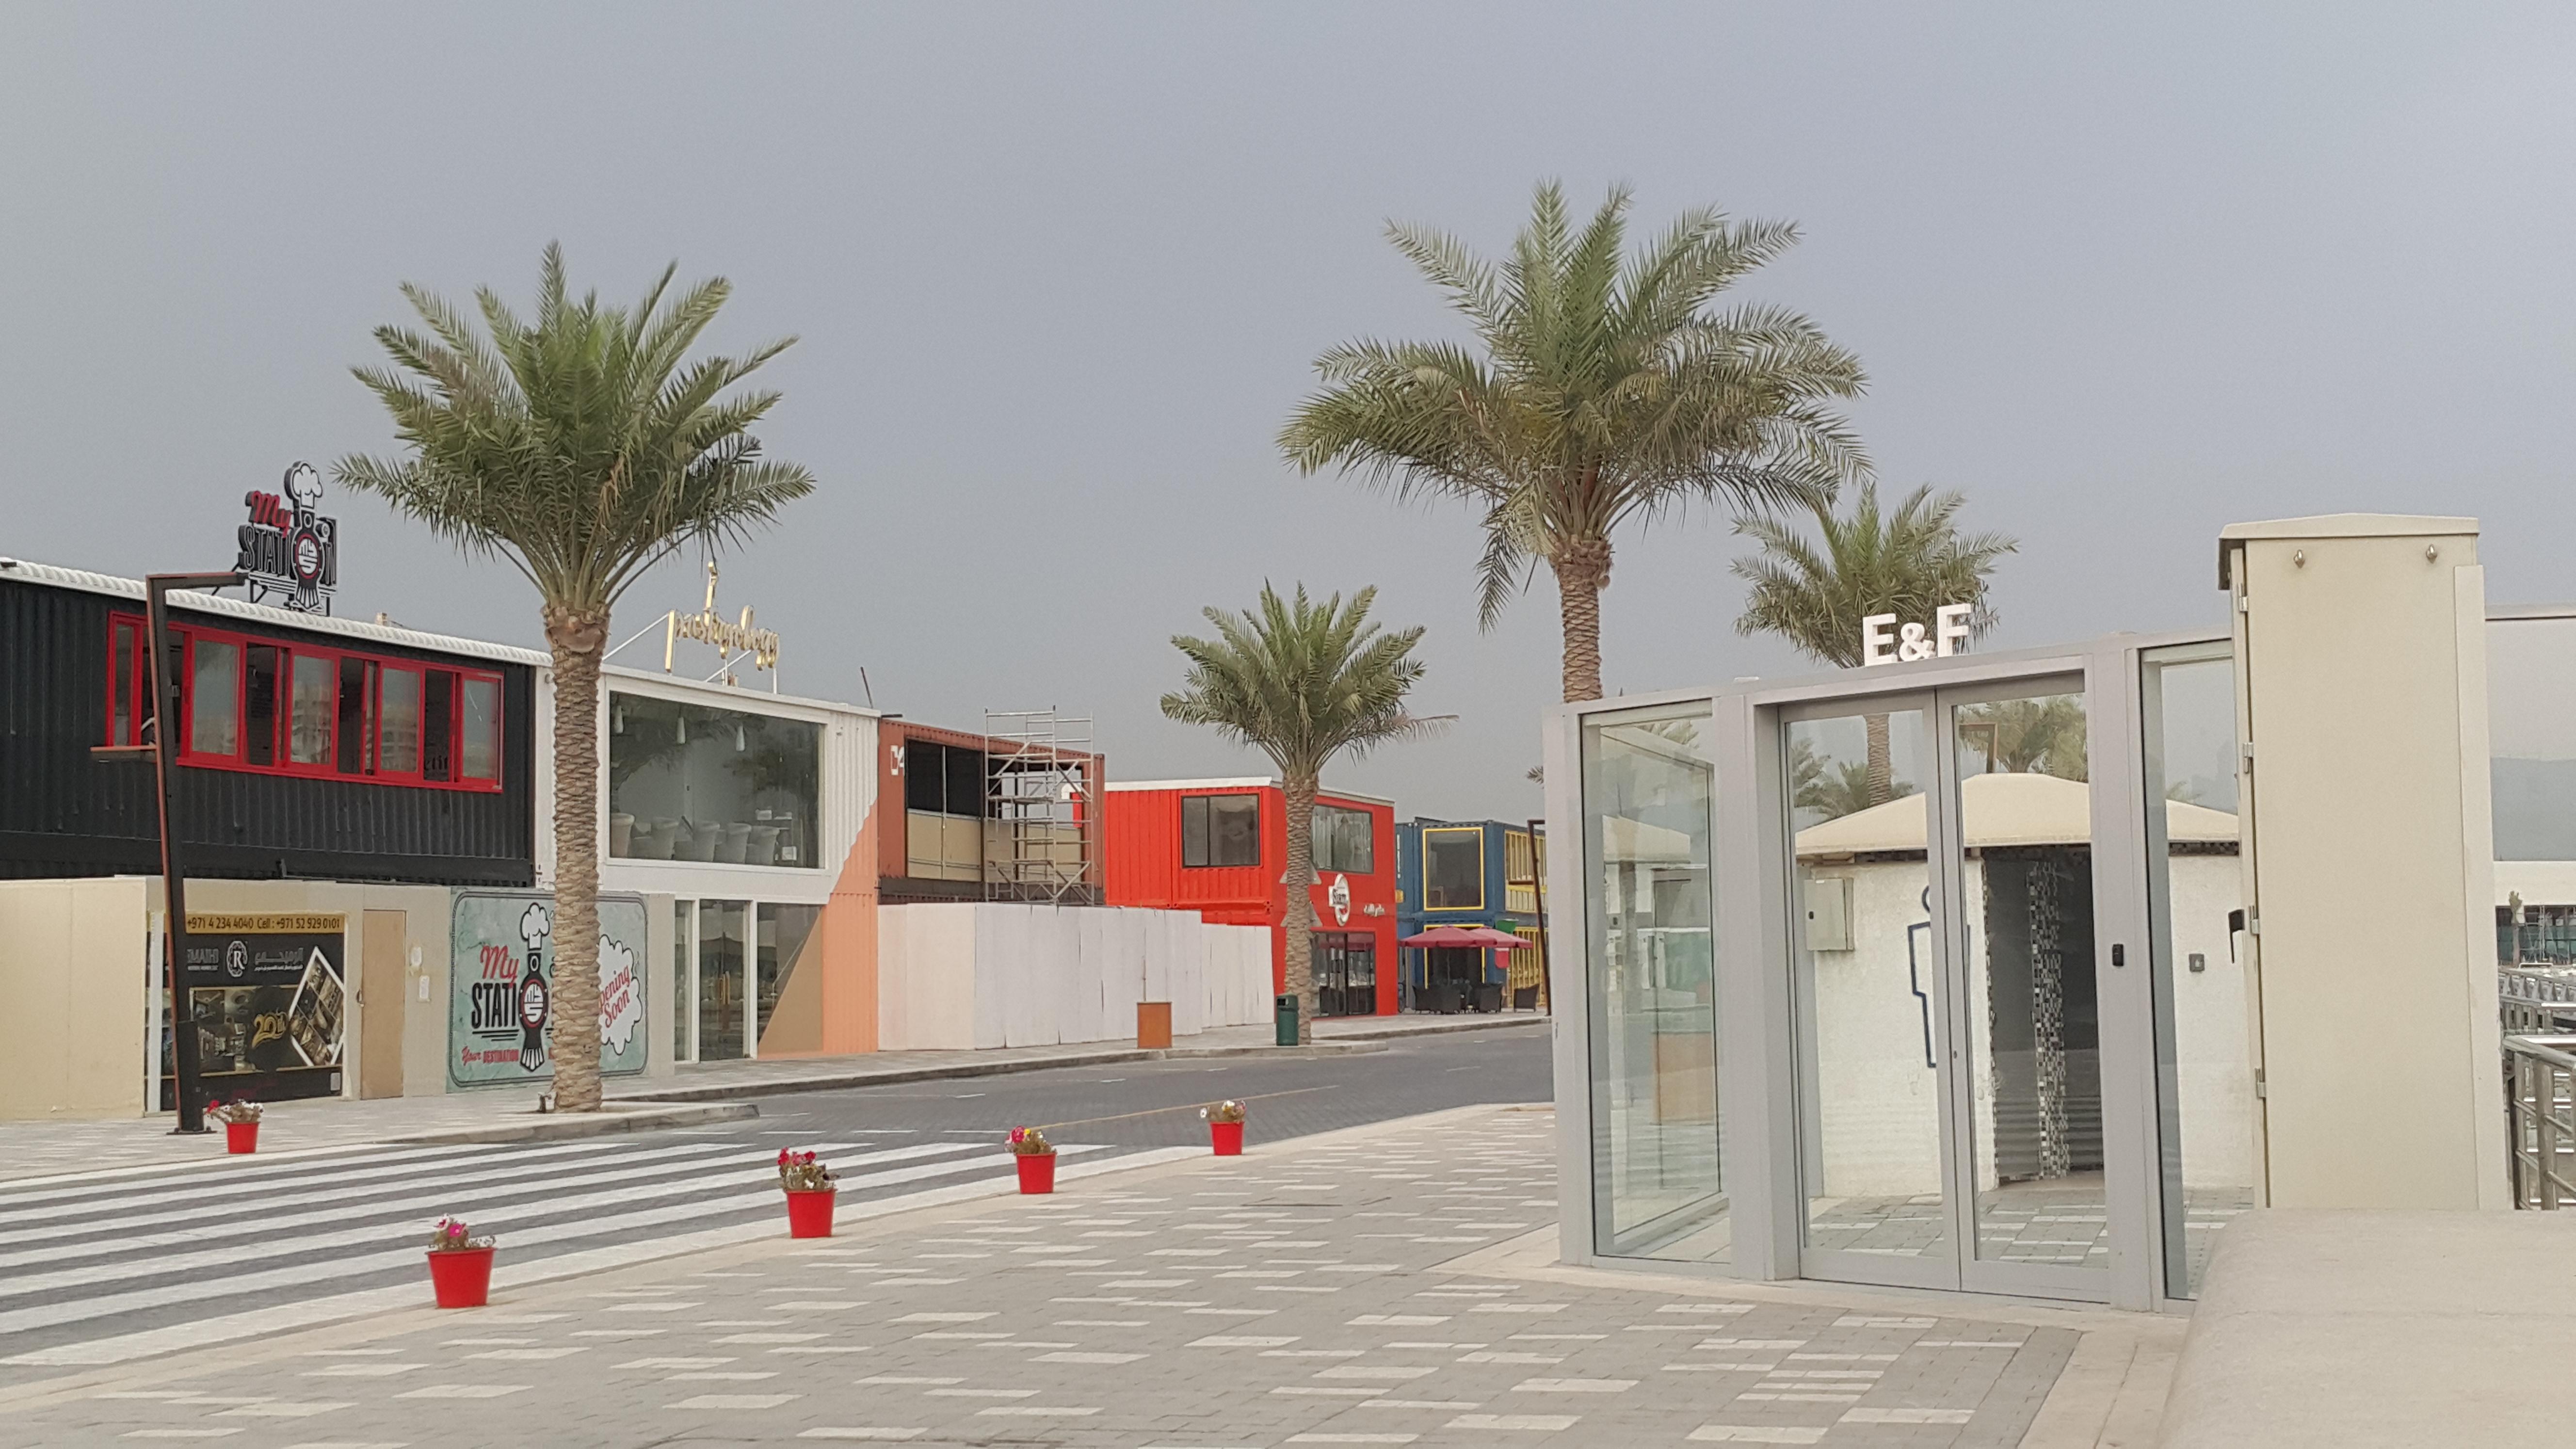 Mina Rashid Marina Gate E & F